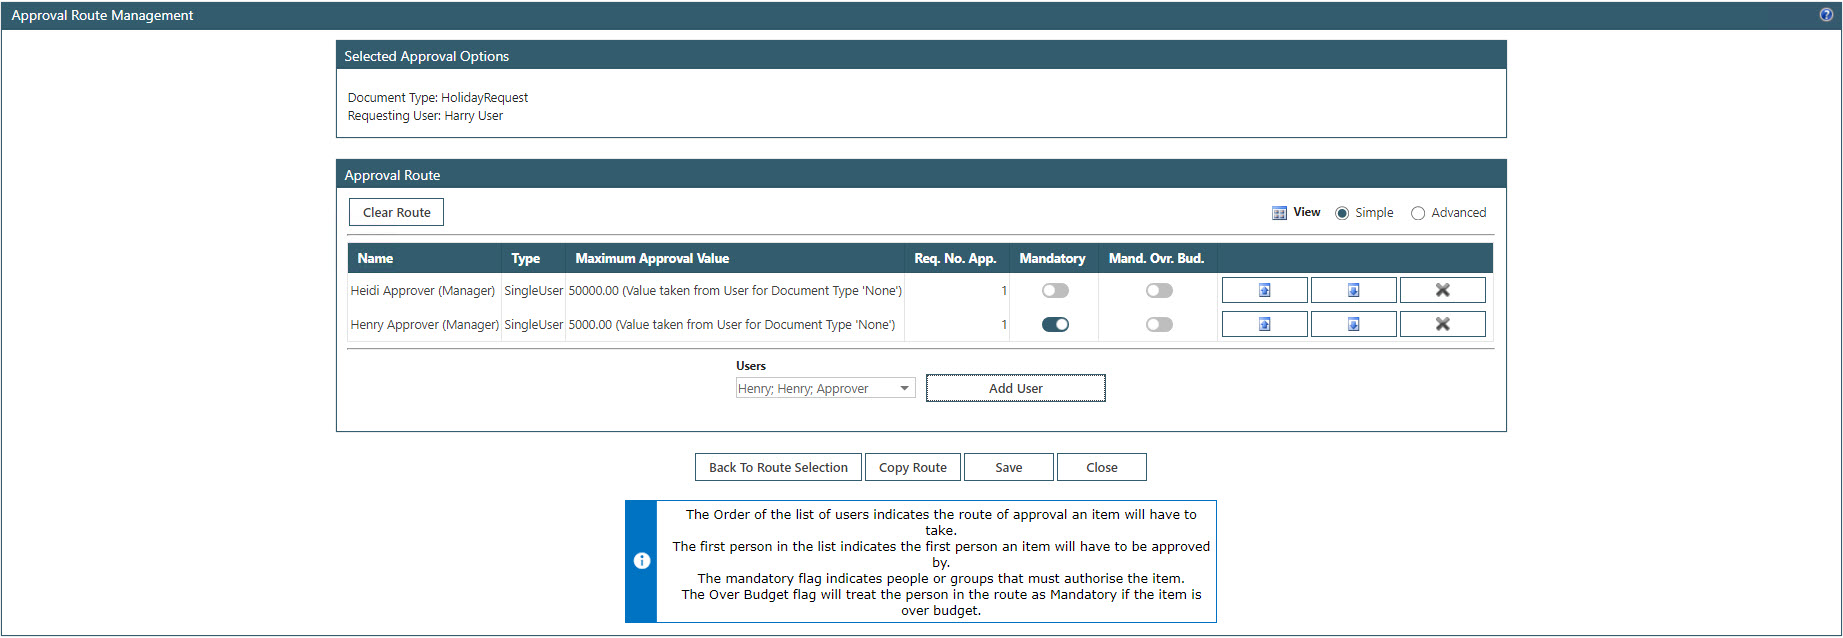 Sicon WAP Holidays Help and User Guide - WAP Holidays HUG Section 8 - Image 1